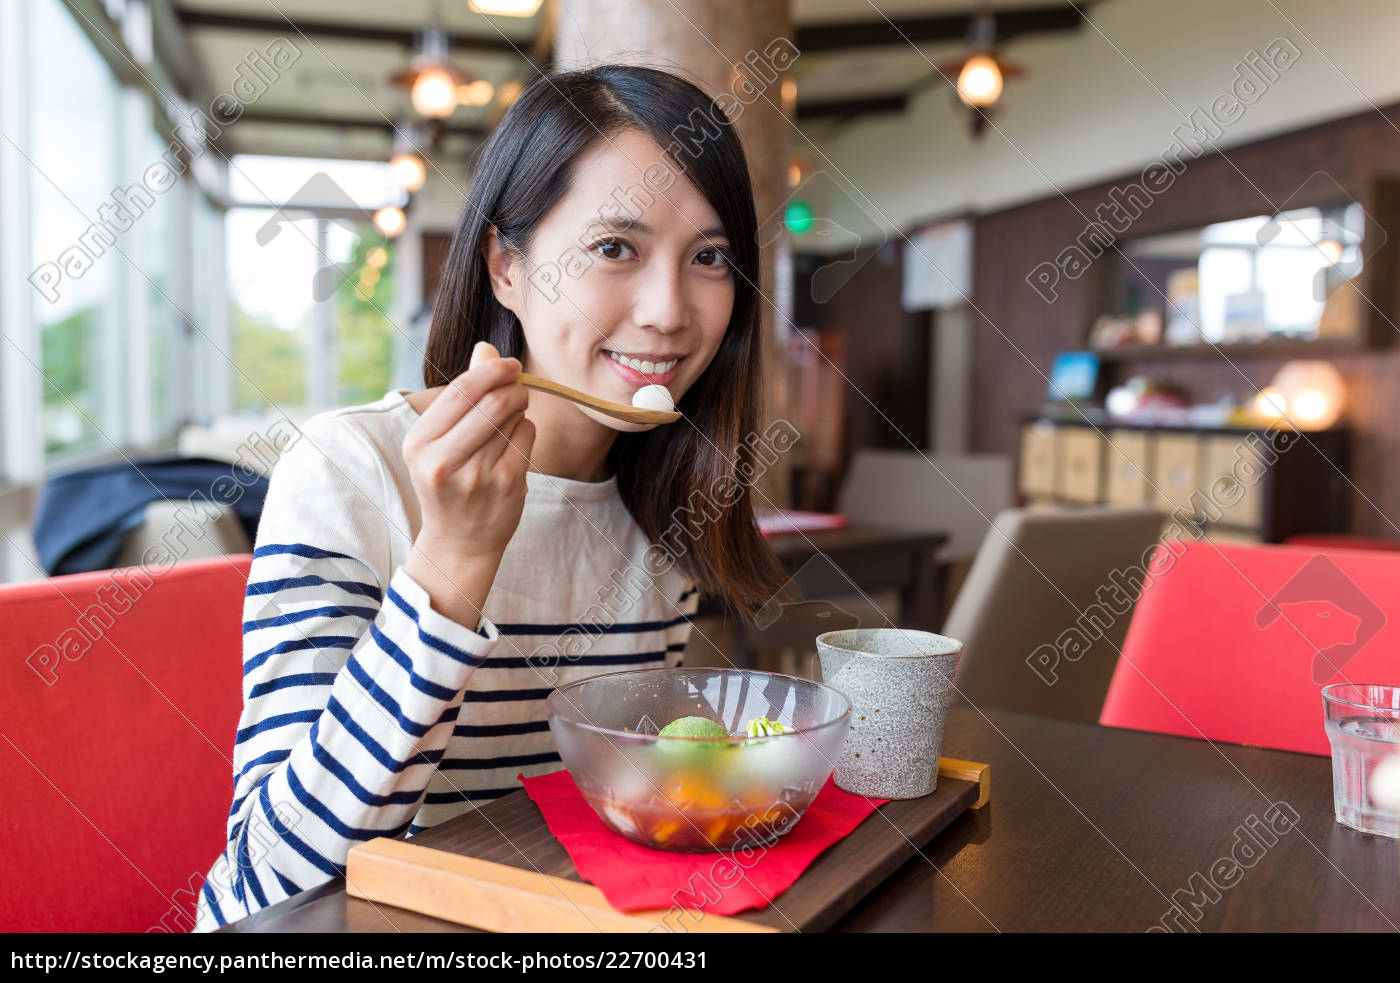 woman, enjoy, japanese, dessert, in, cafe - 22700431